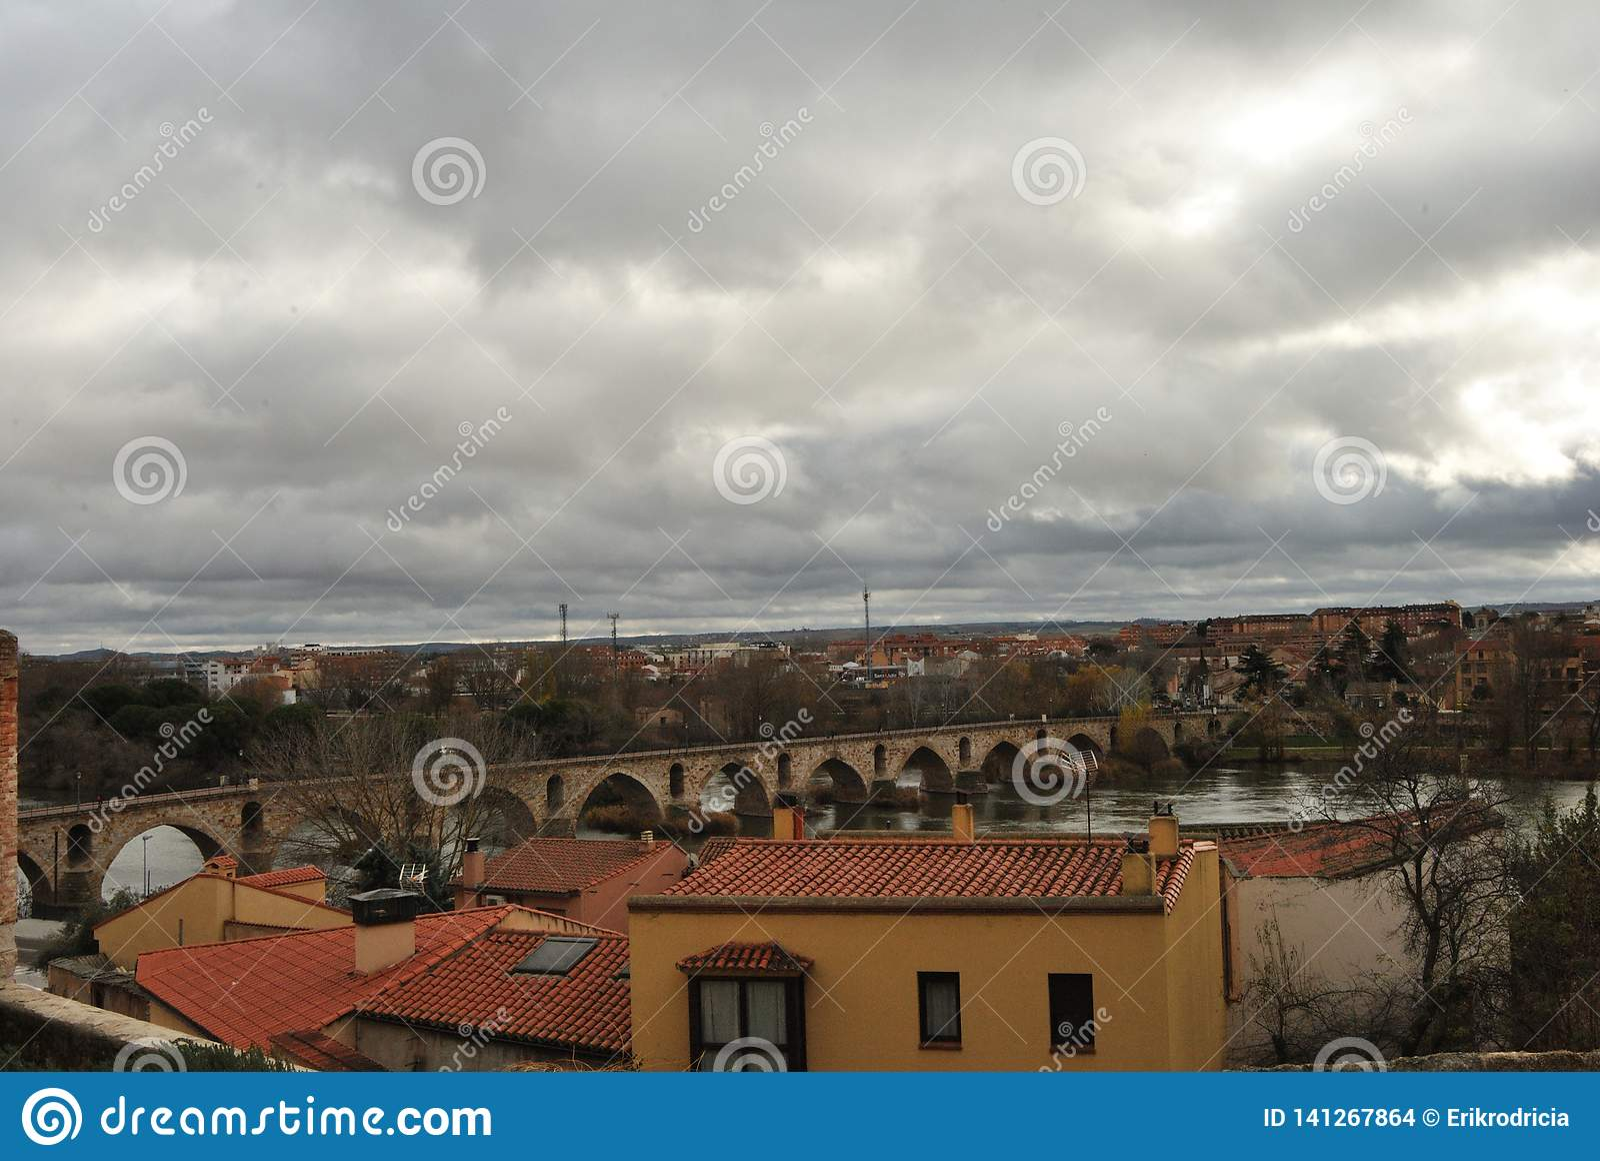 Duero River and stone bridge from Pizarro` Street viewpoint, Zamora, Spain